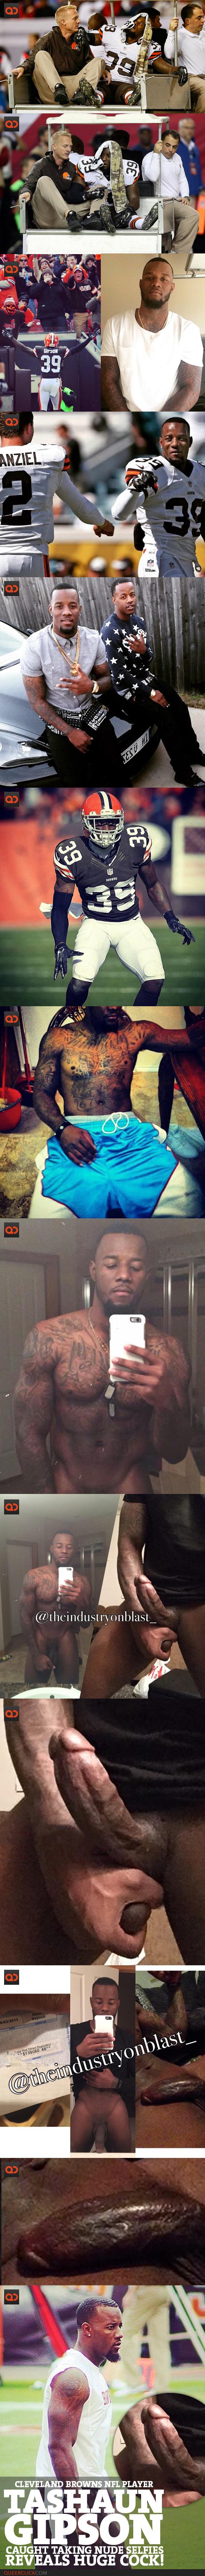 qc-exposed_celebs_tashaun_gipson_nfl_player_leaked_naked_photos-collage02